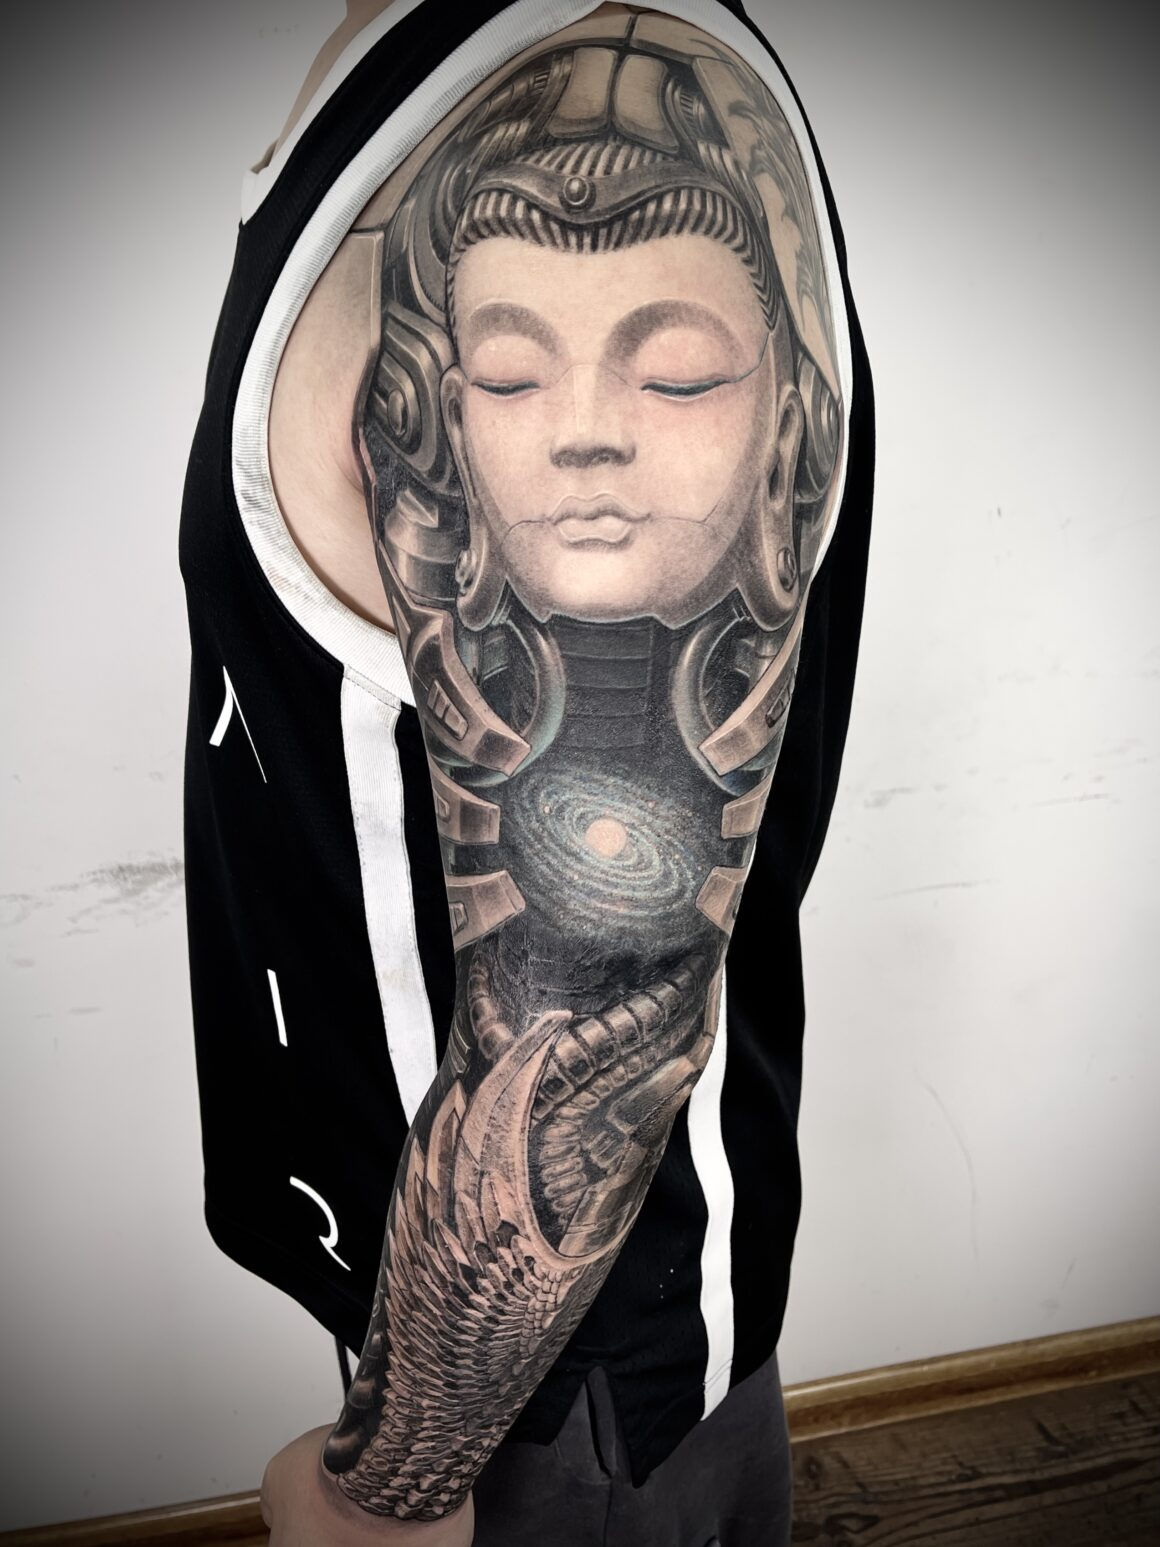 Tattoo by Heng Yue, @hengyue_newassasin_tattoo